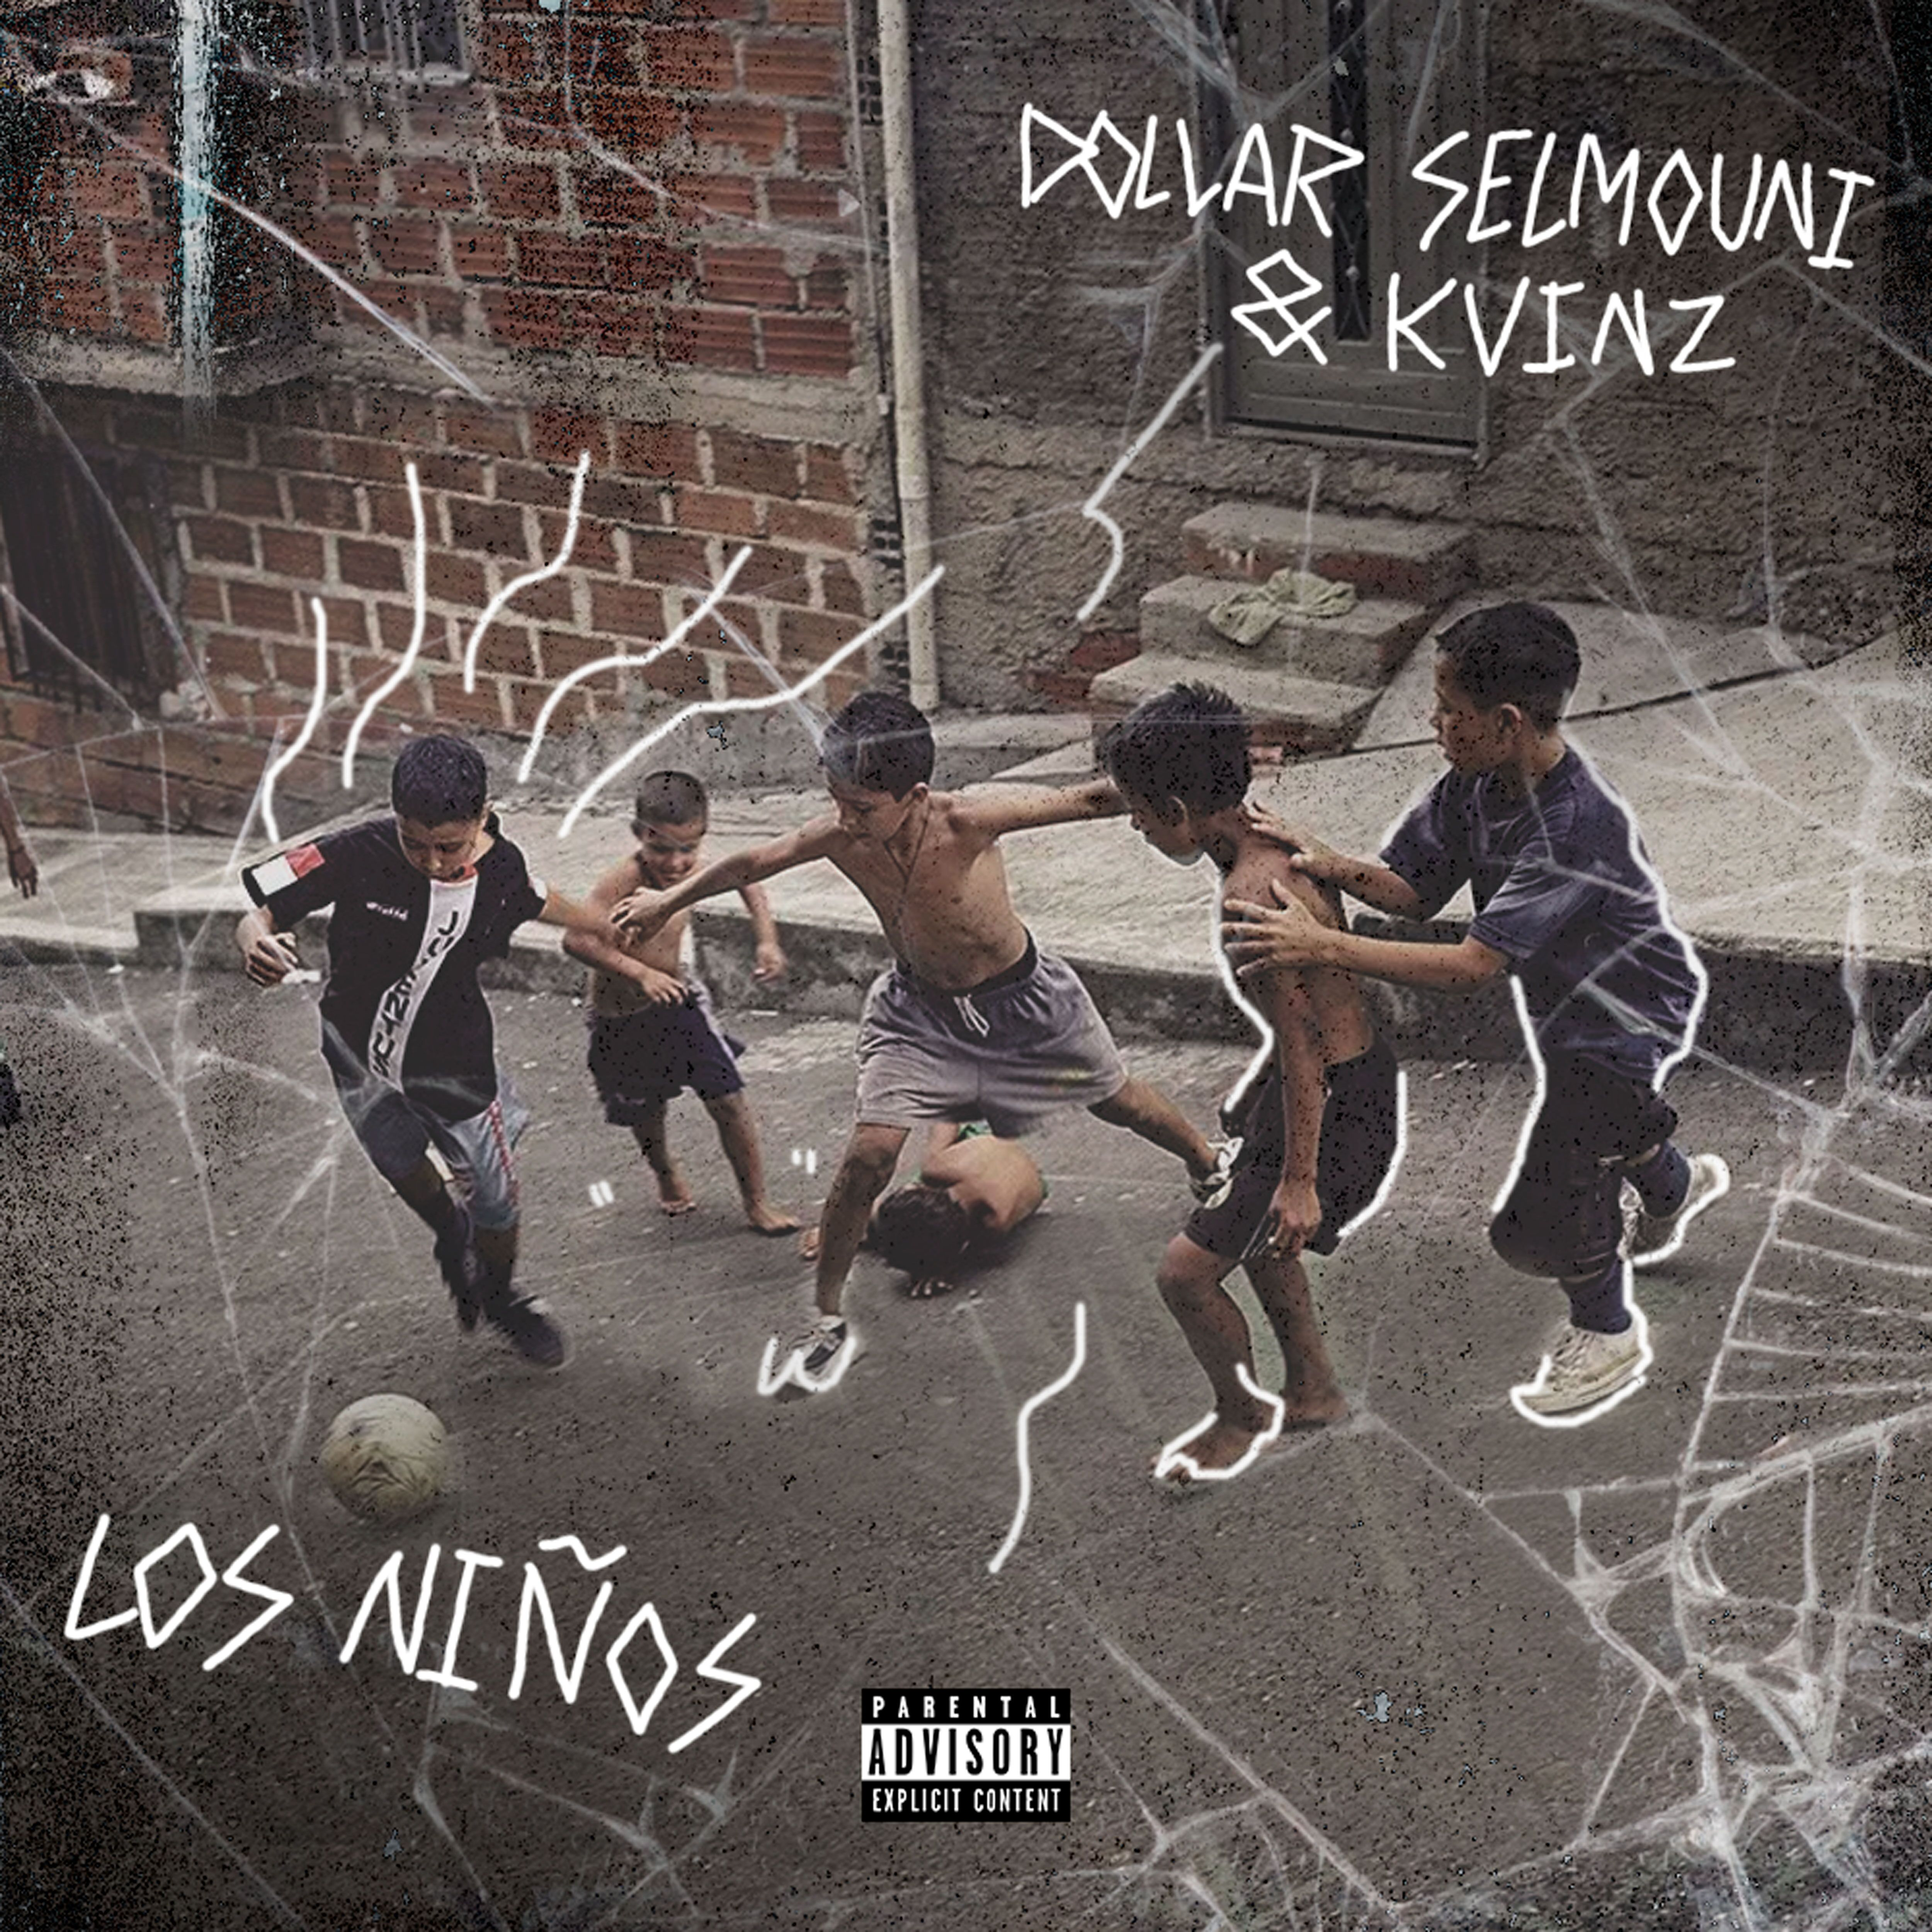 Dollar_selmouni_kvinz_los_ni_os